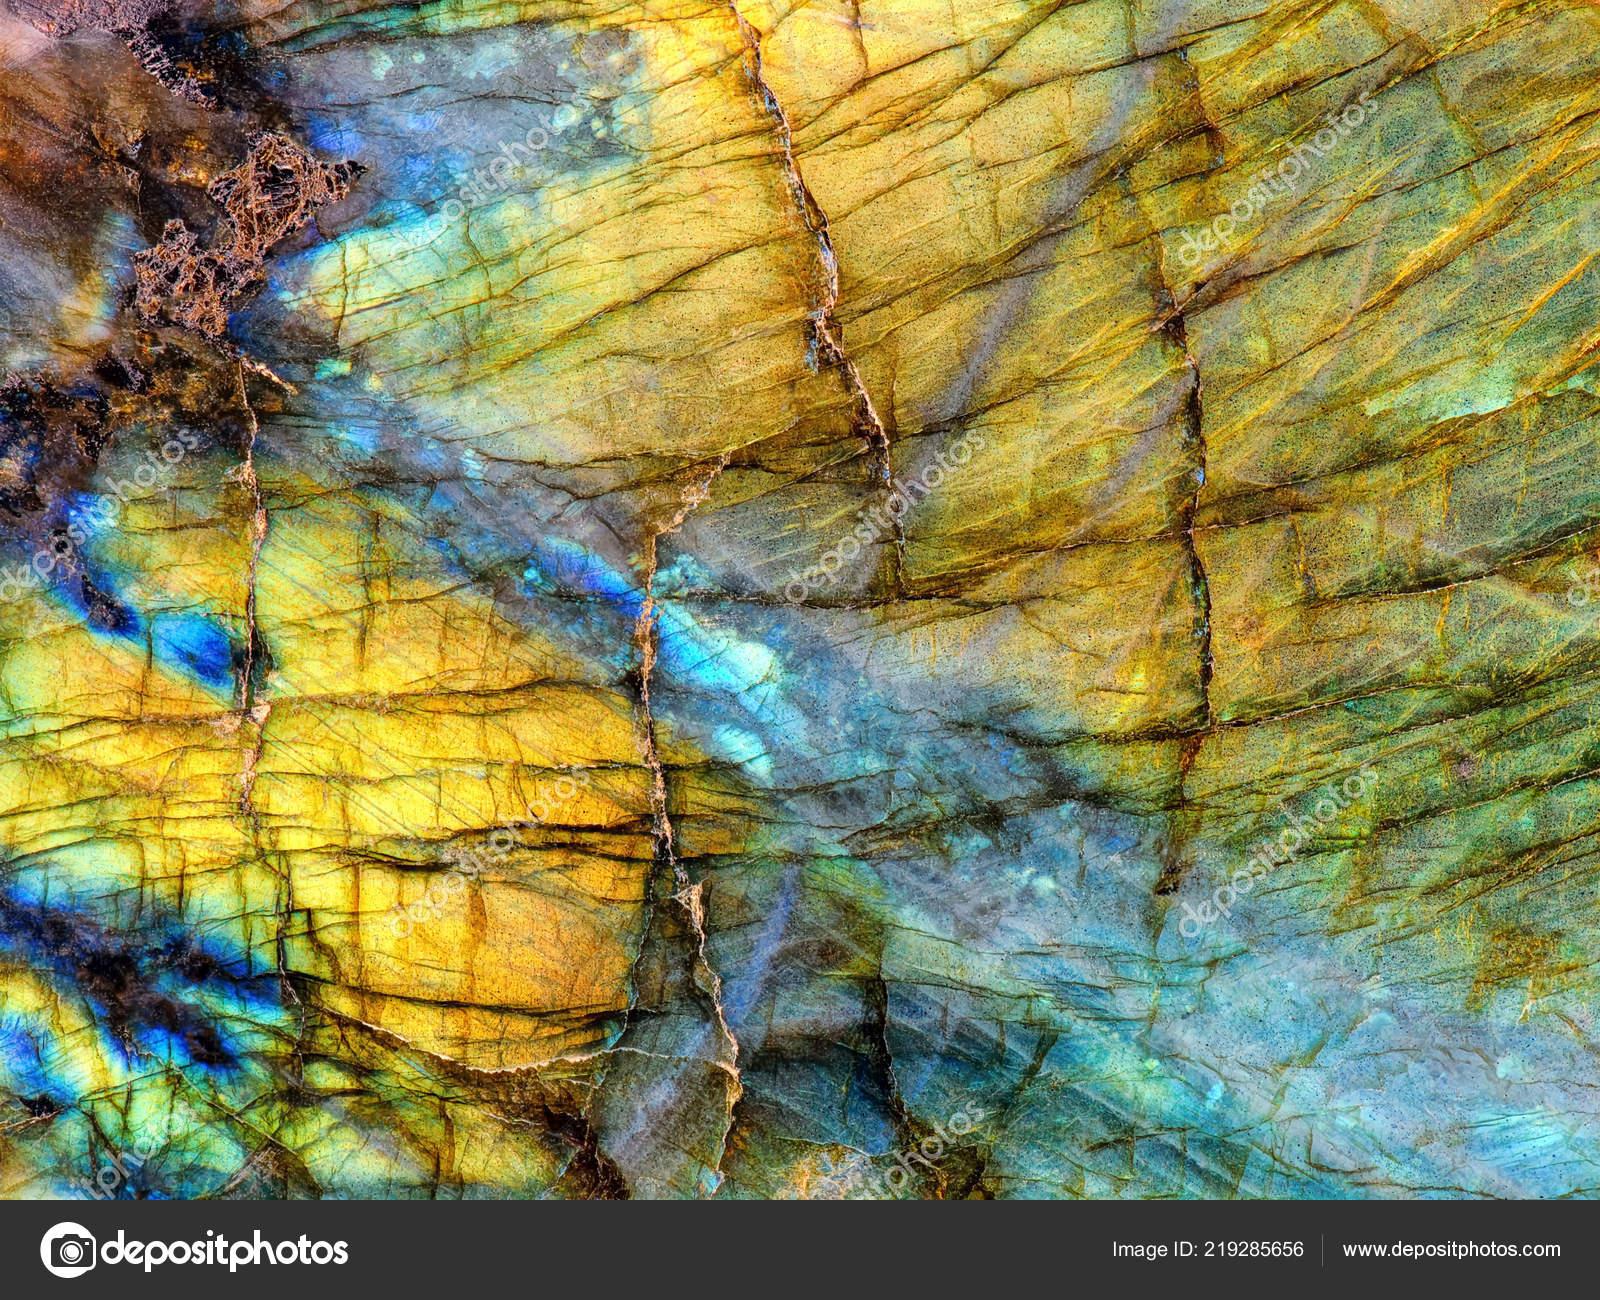 Amazing Colorful Texture Iridescence Labradorite Mineral